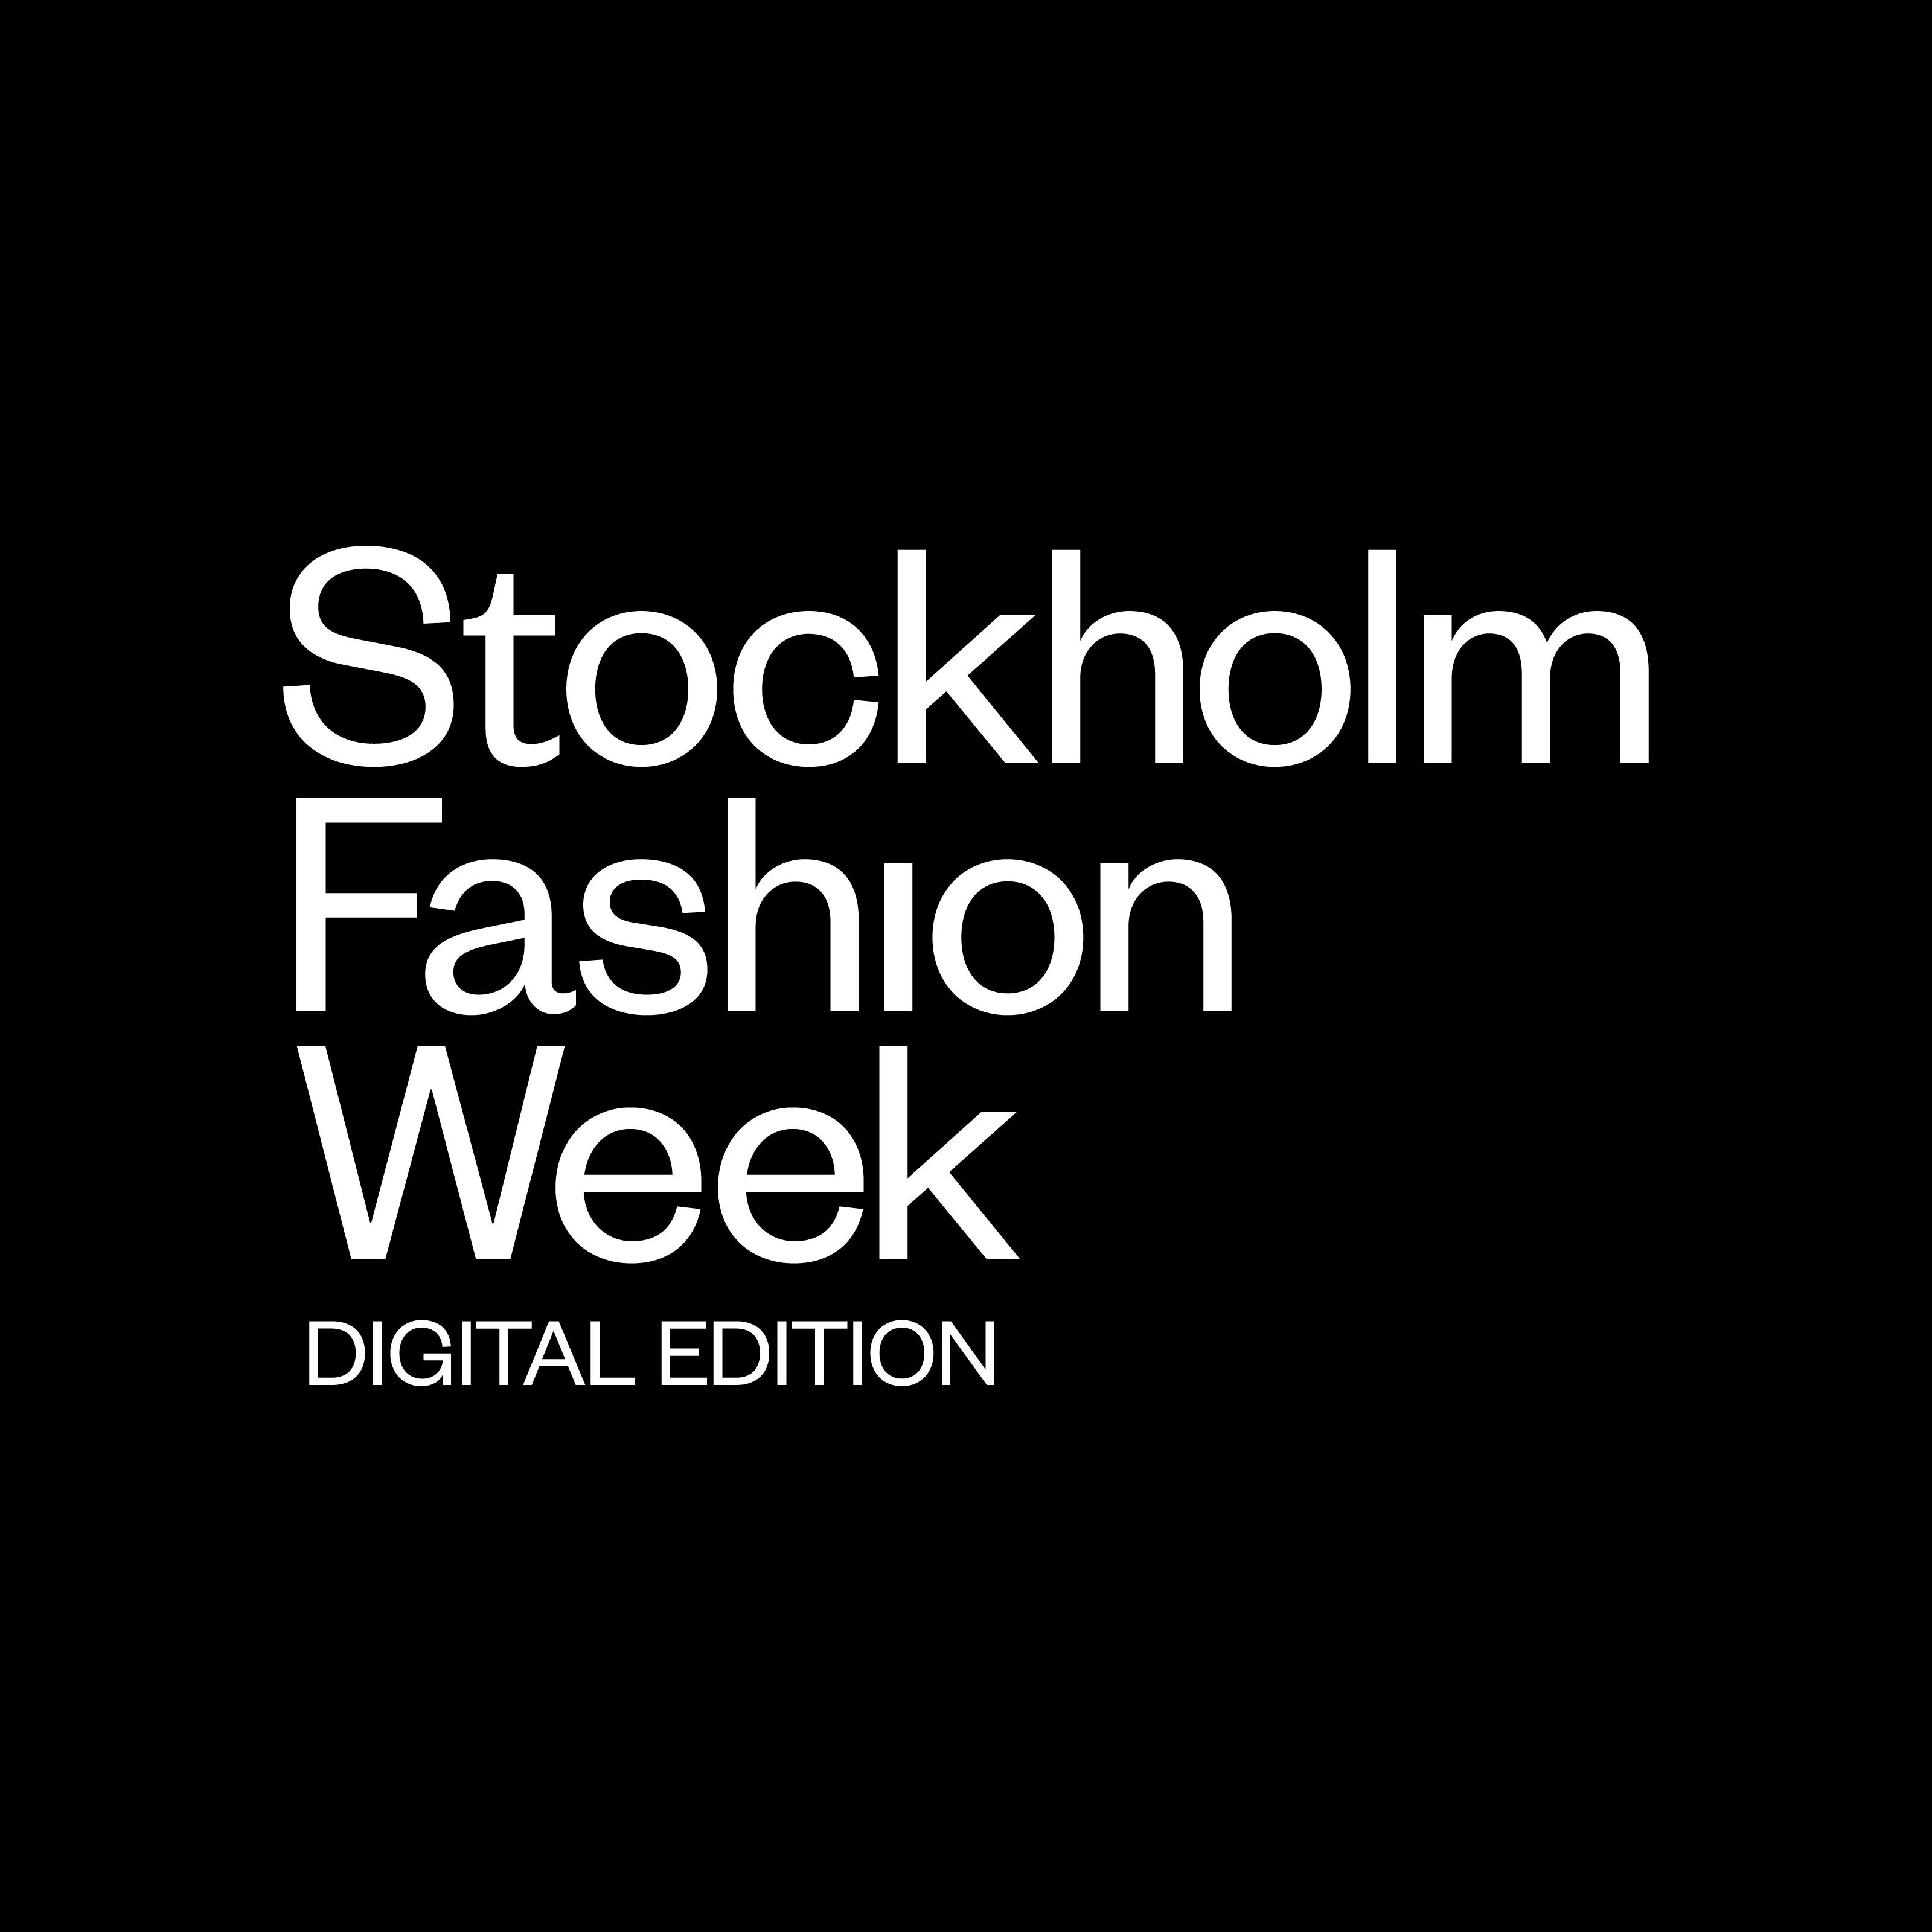 stockholmfashionweek.se